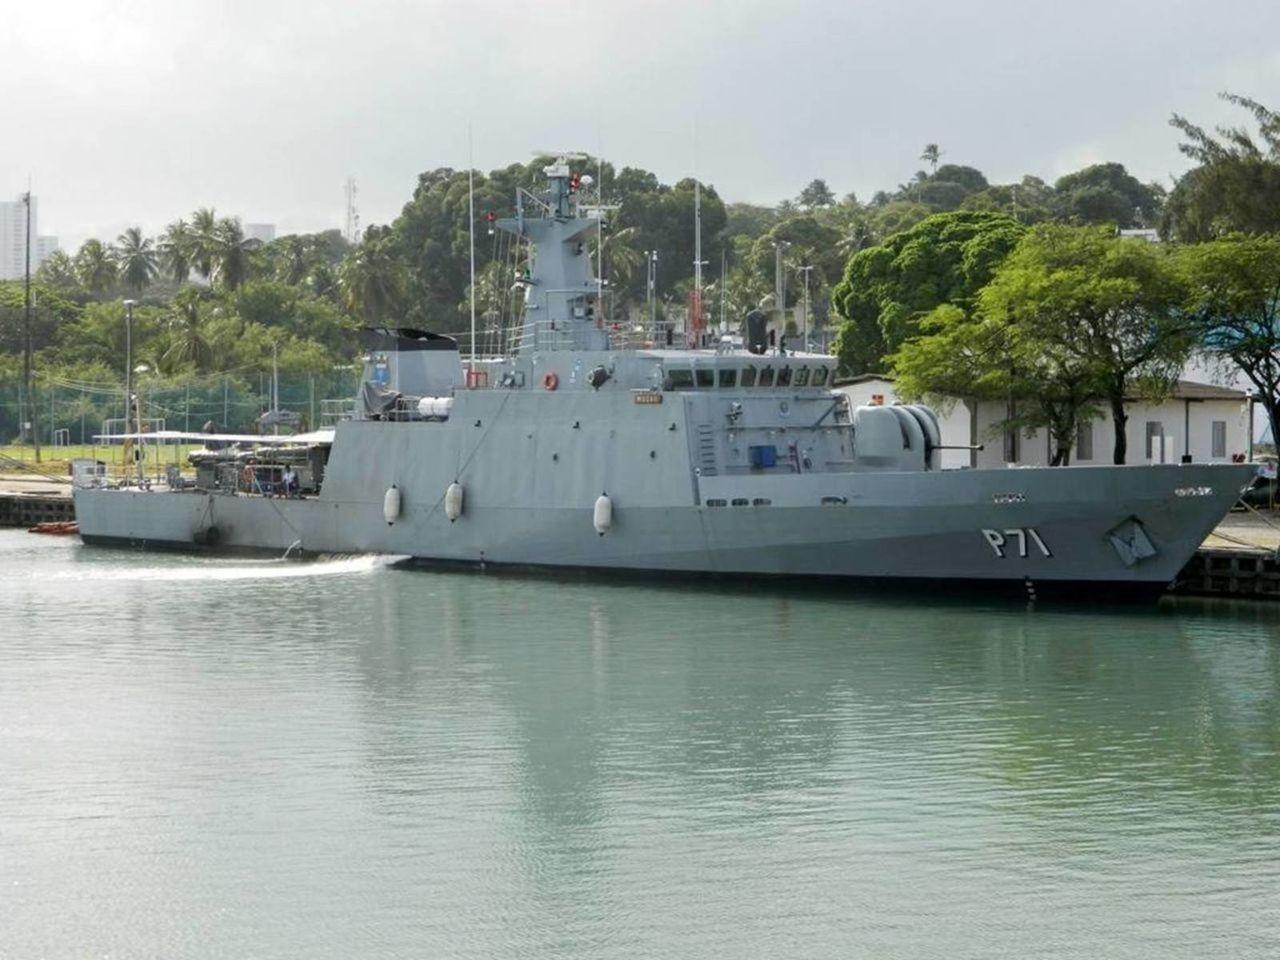 El primer patrullero de la clase Macaé inicia su vida operativa en la Marina de Brasil. P71macaeclass_BRASIL